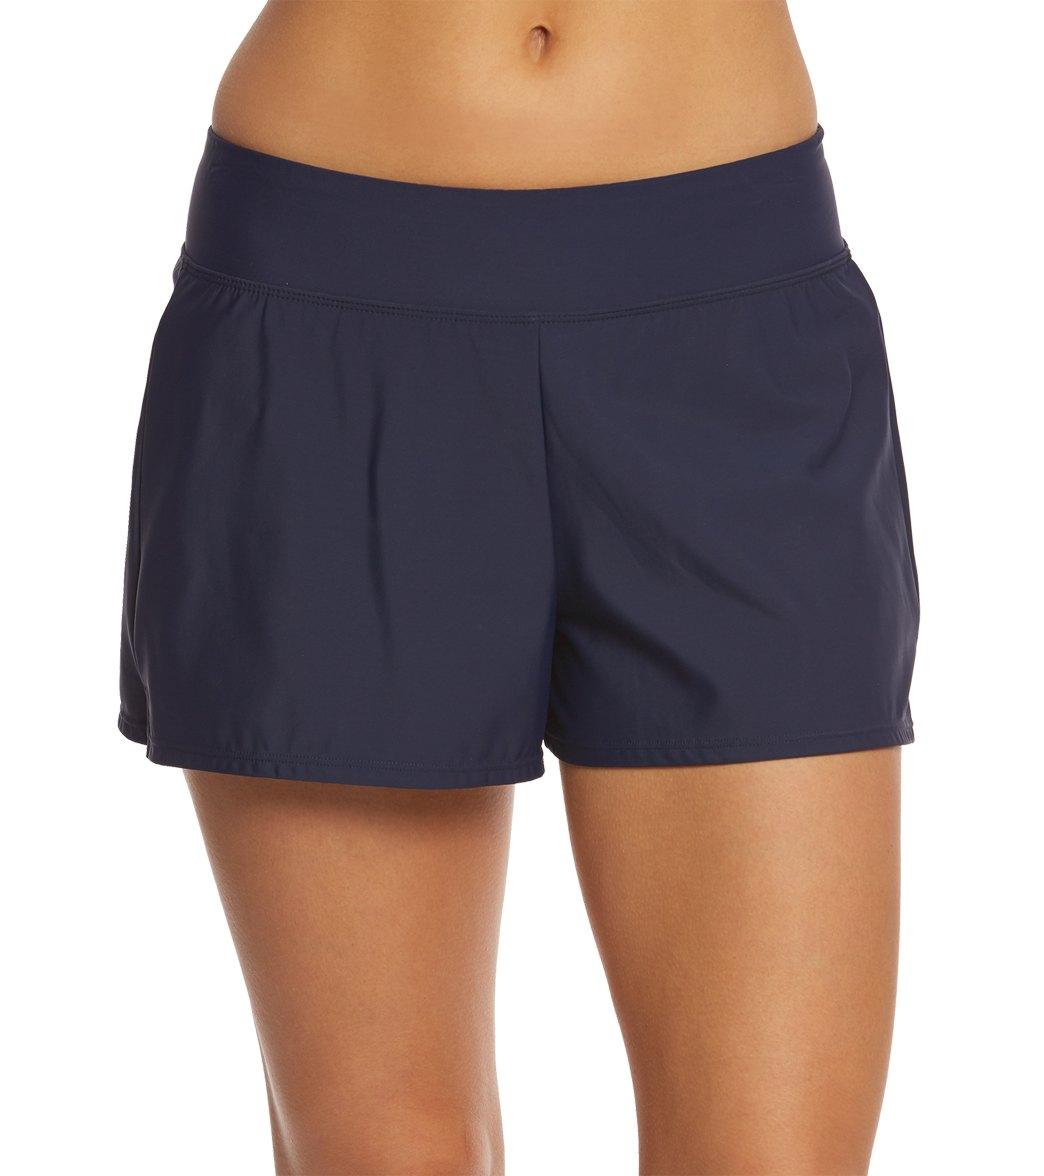 1c290ea857 How to Choose Flattering Plus Size Swimwear